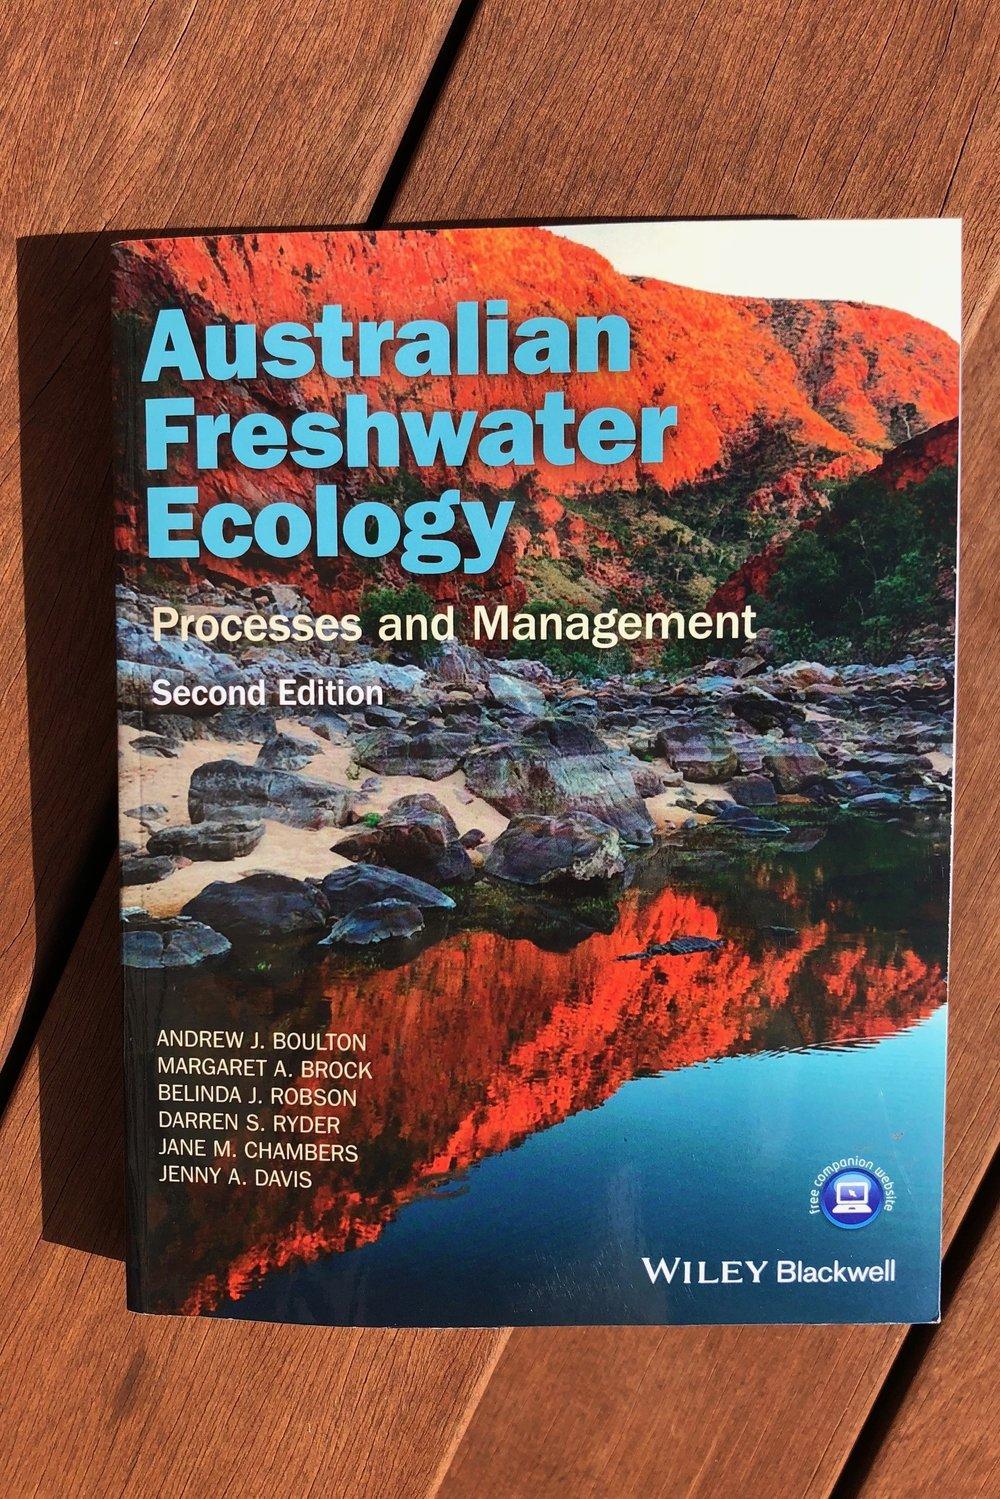 Australian Freshwater Ecology has been added